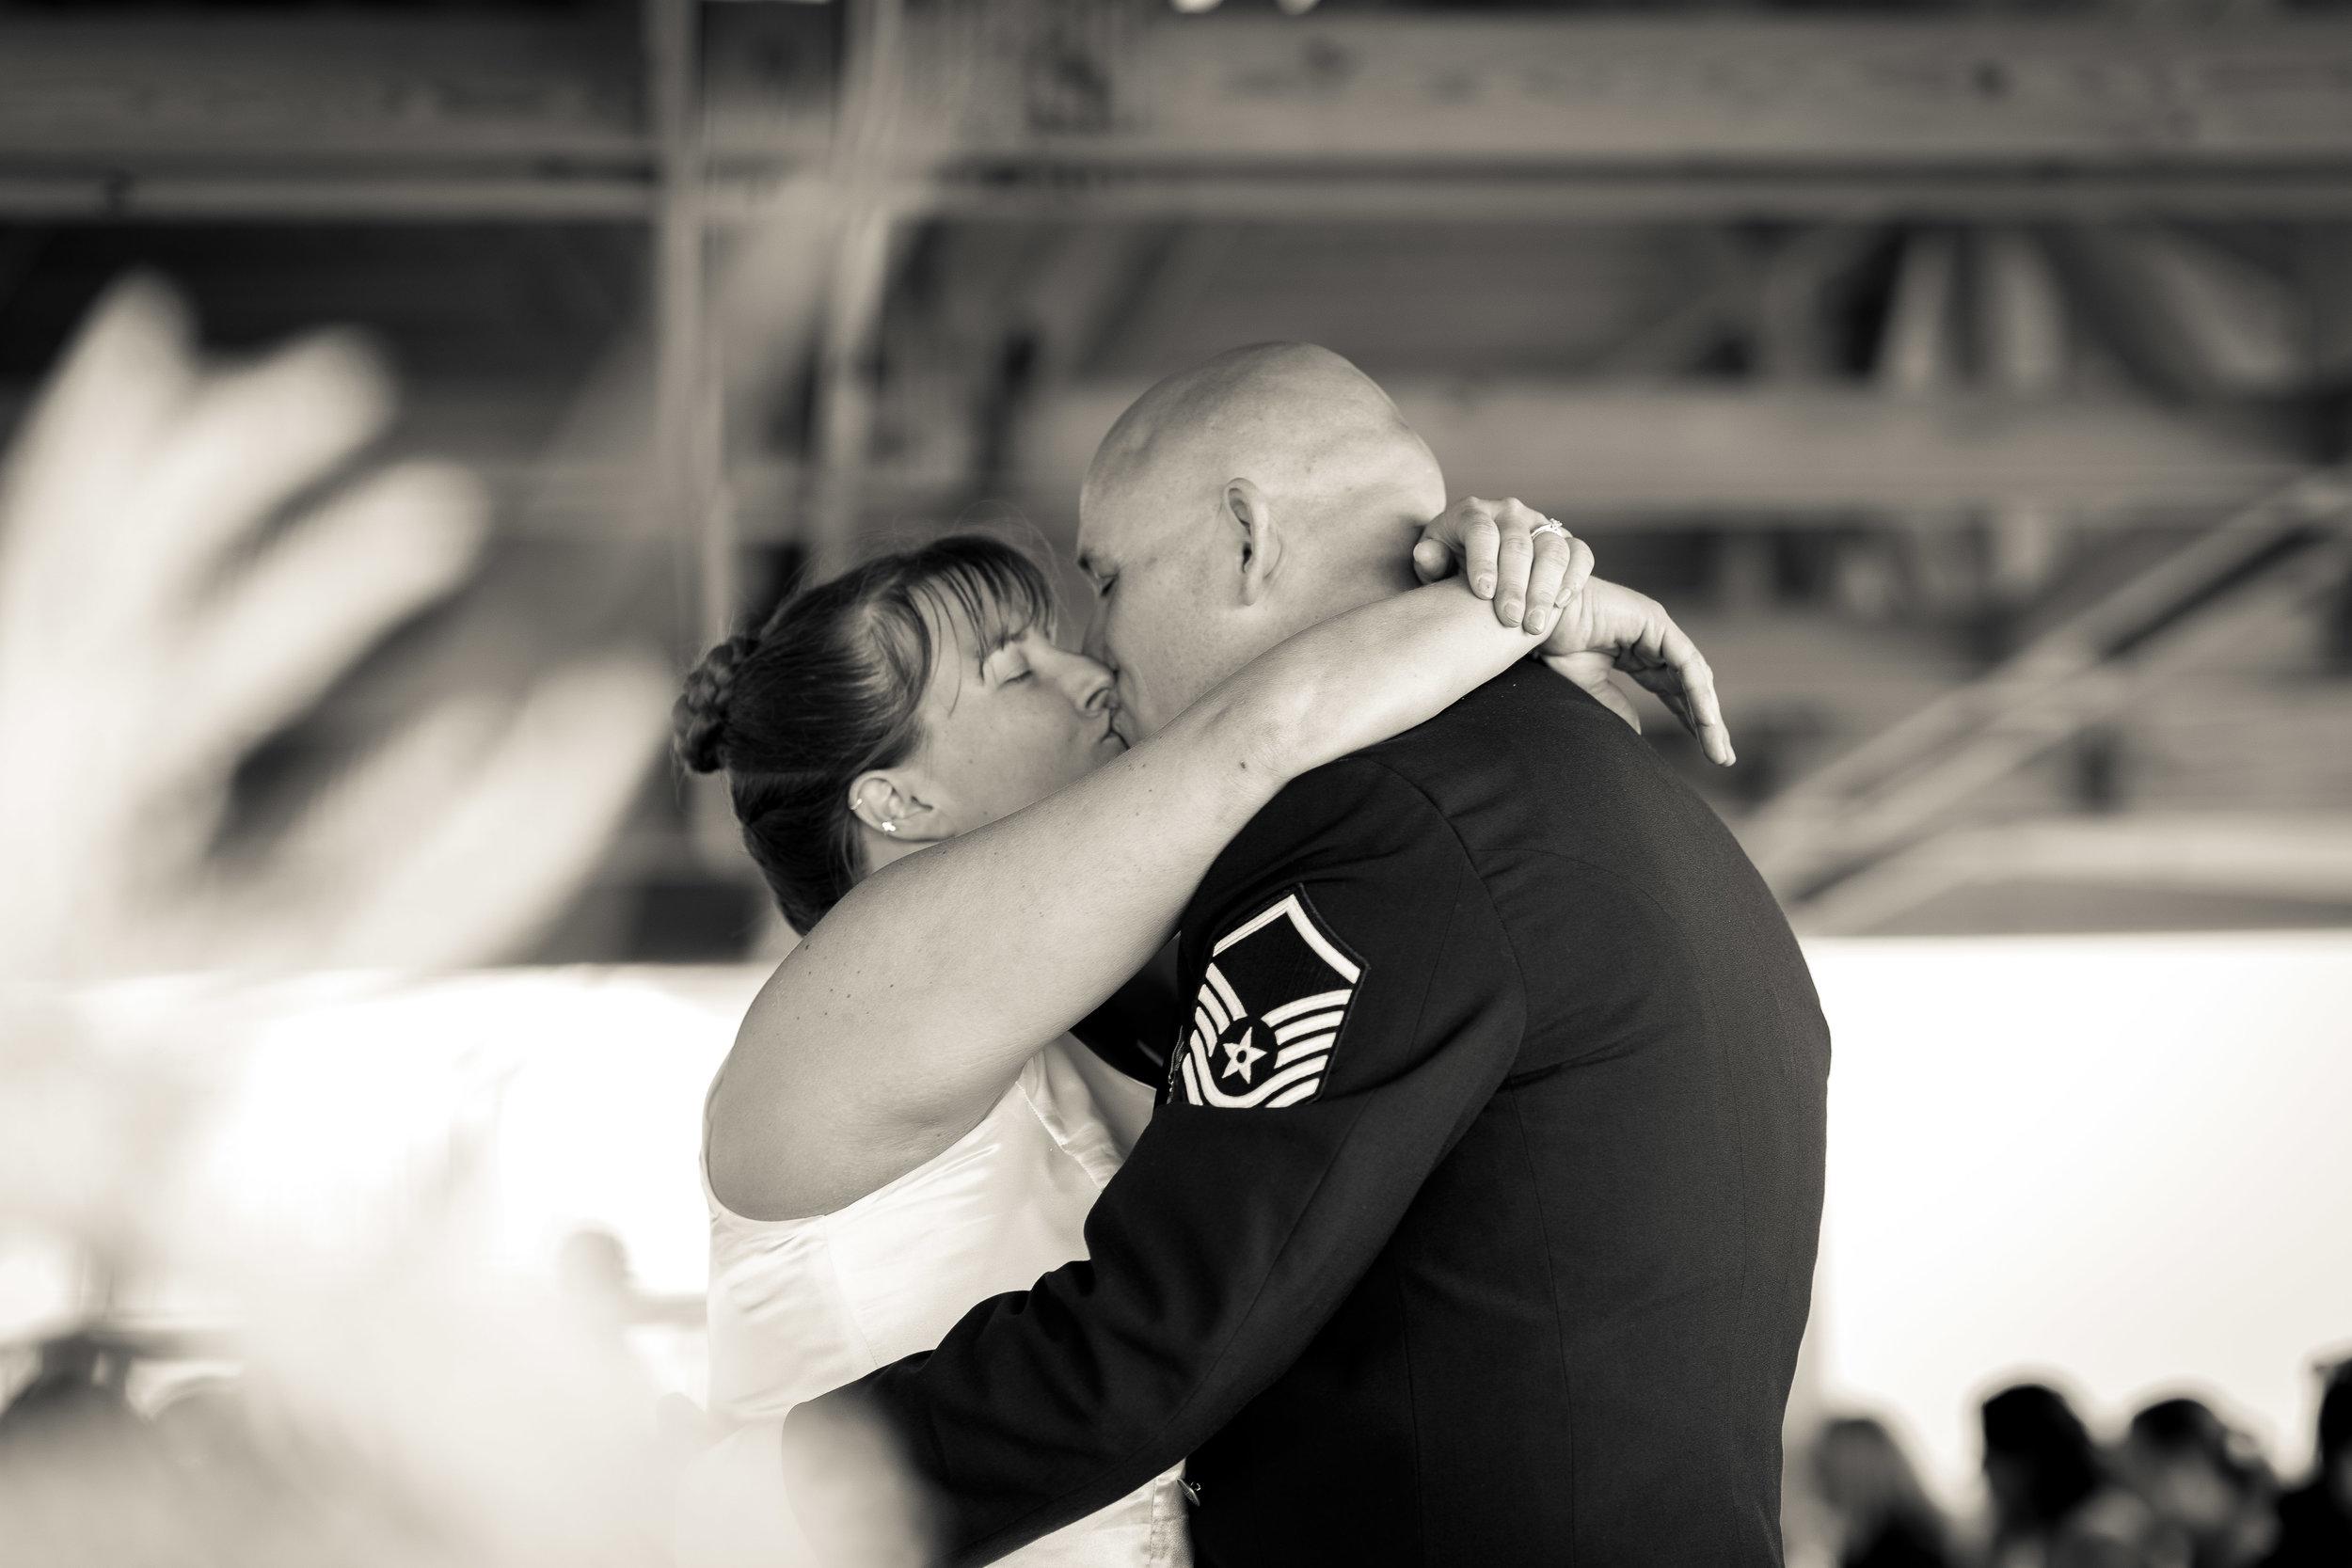 black and white image of bride and groom dancing pensacola florida wedding